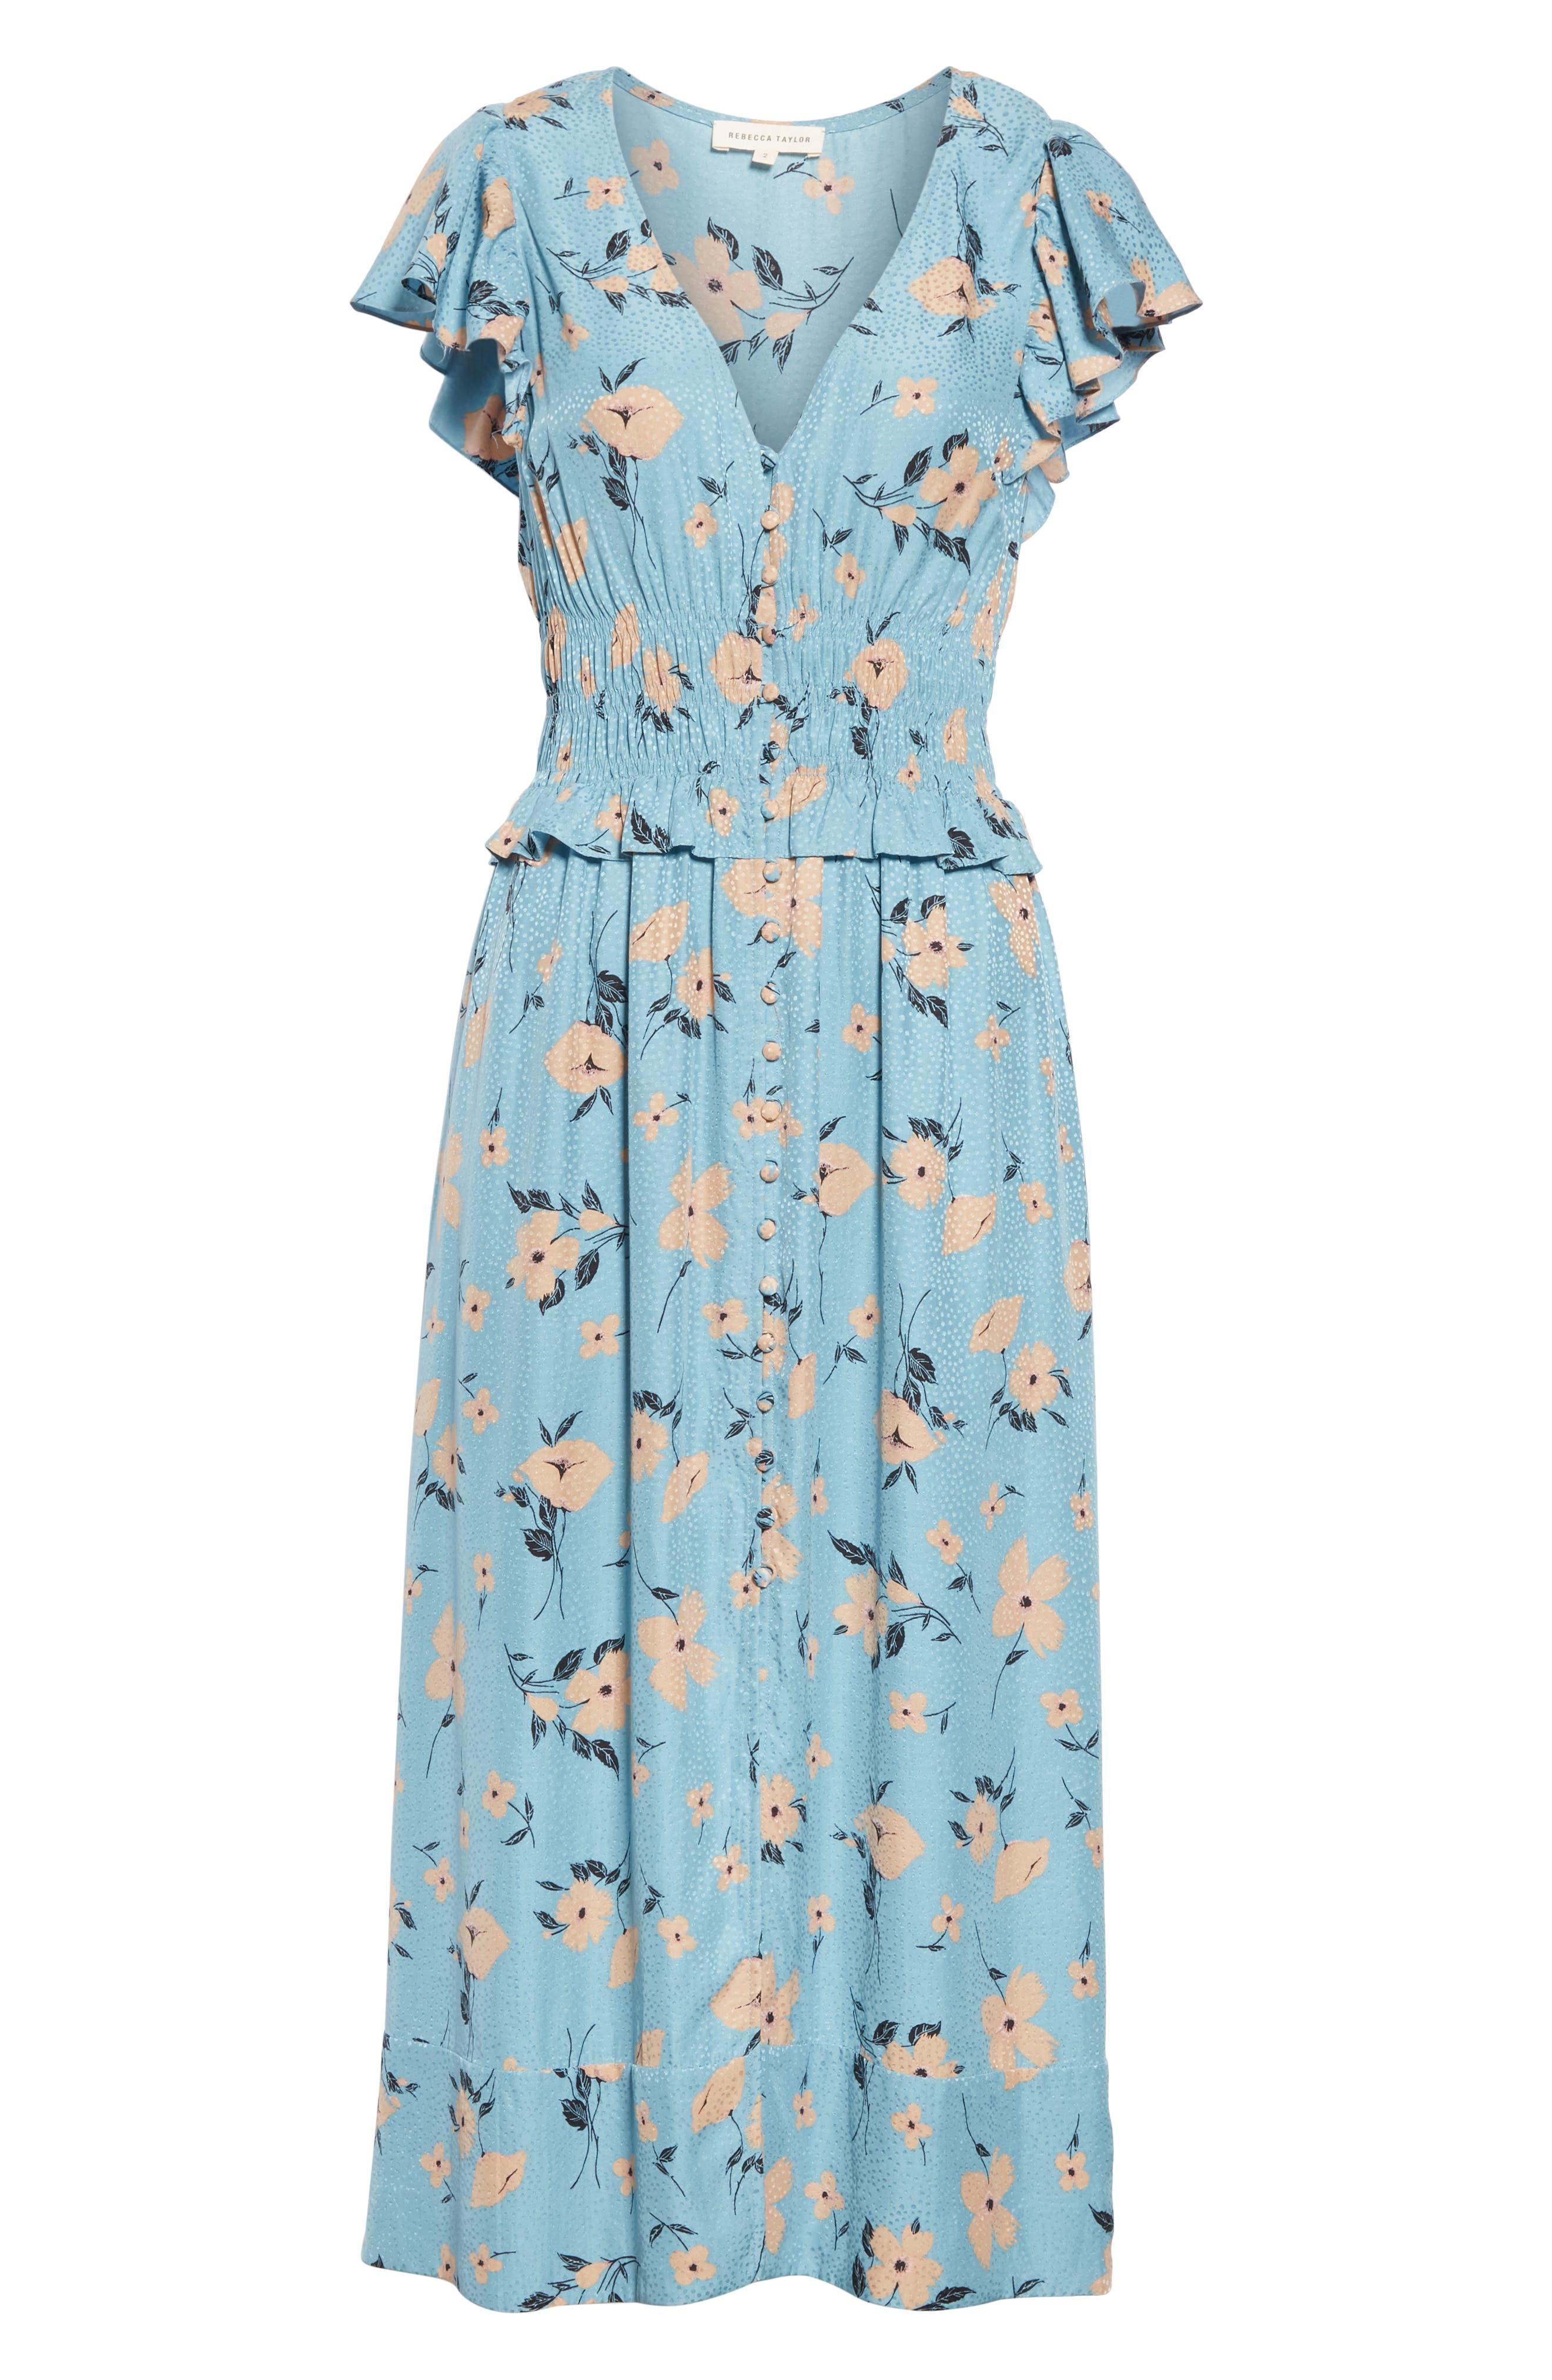 REBECCA TAYLOR,                             Daniella Floral Jacquard Silk Blend Dress,                             Alternate thumbnail 6, color,                             LAGOON COMBO